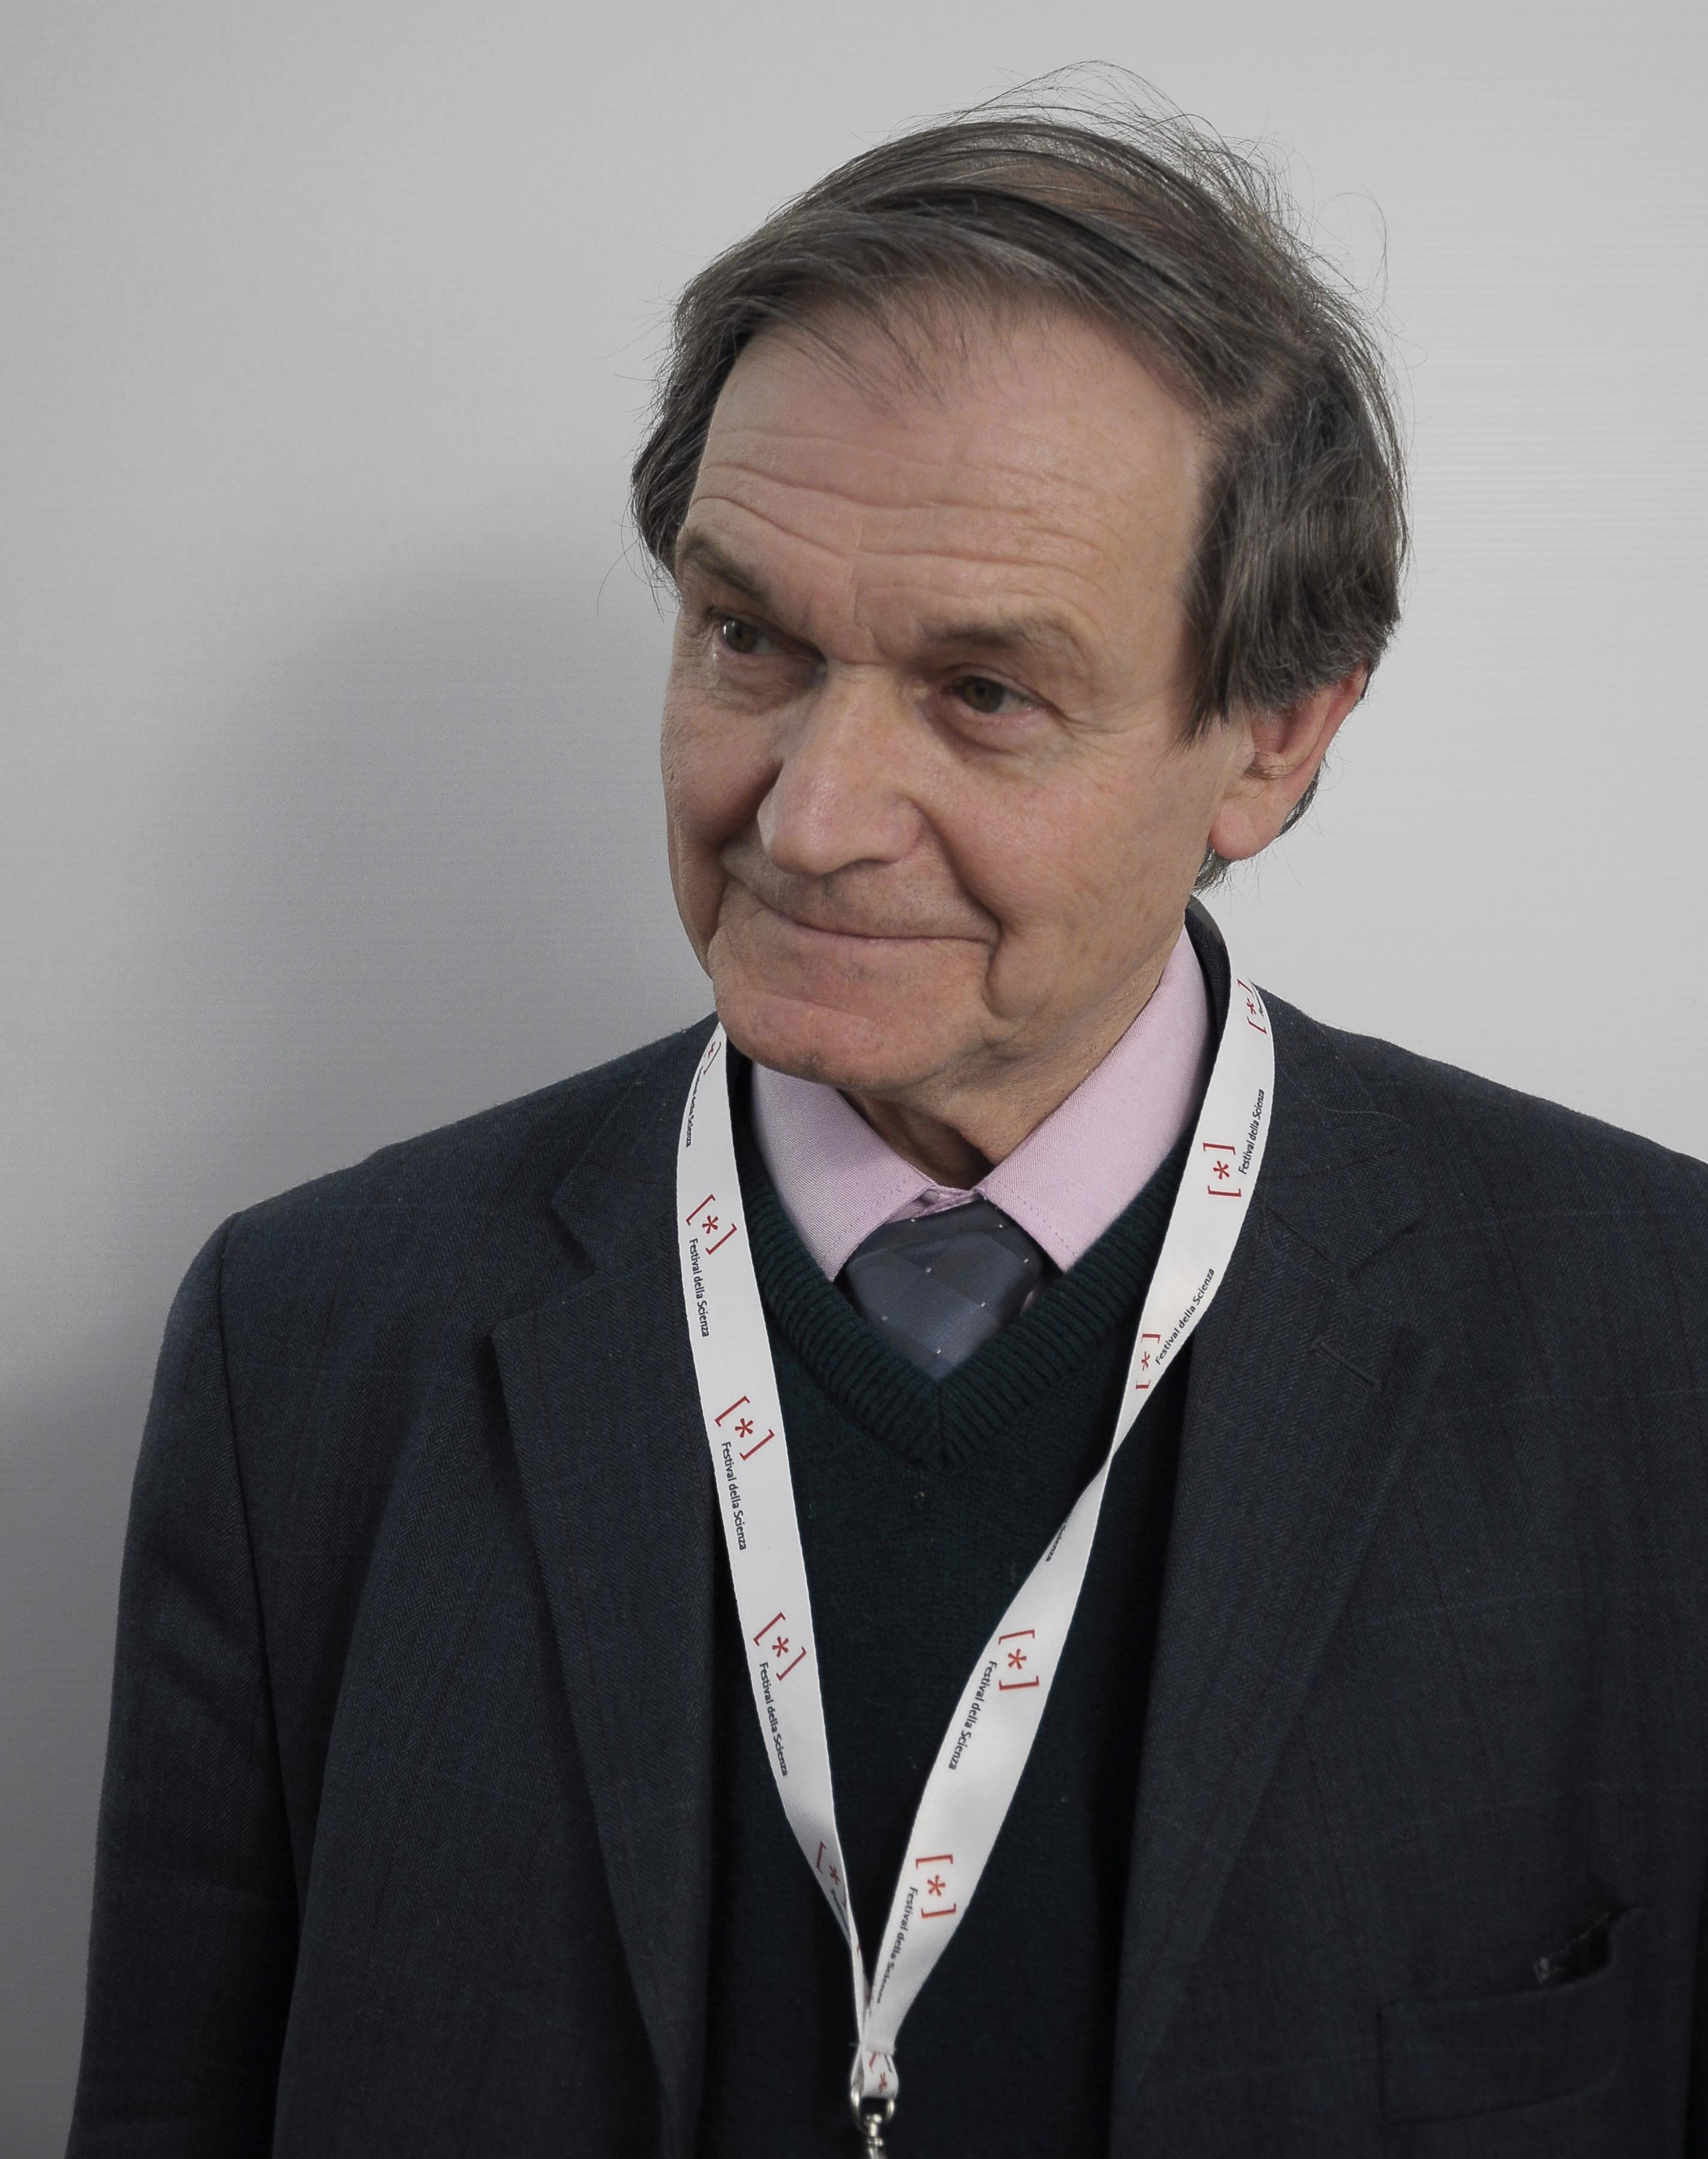 Roger Penrose Wikipedia